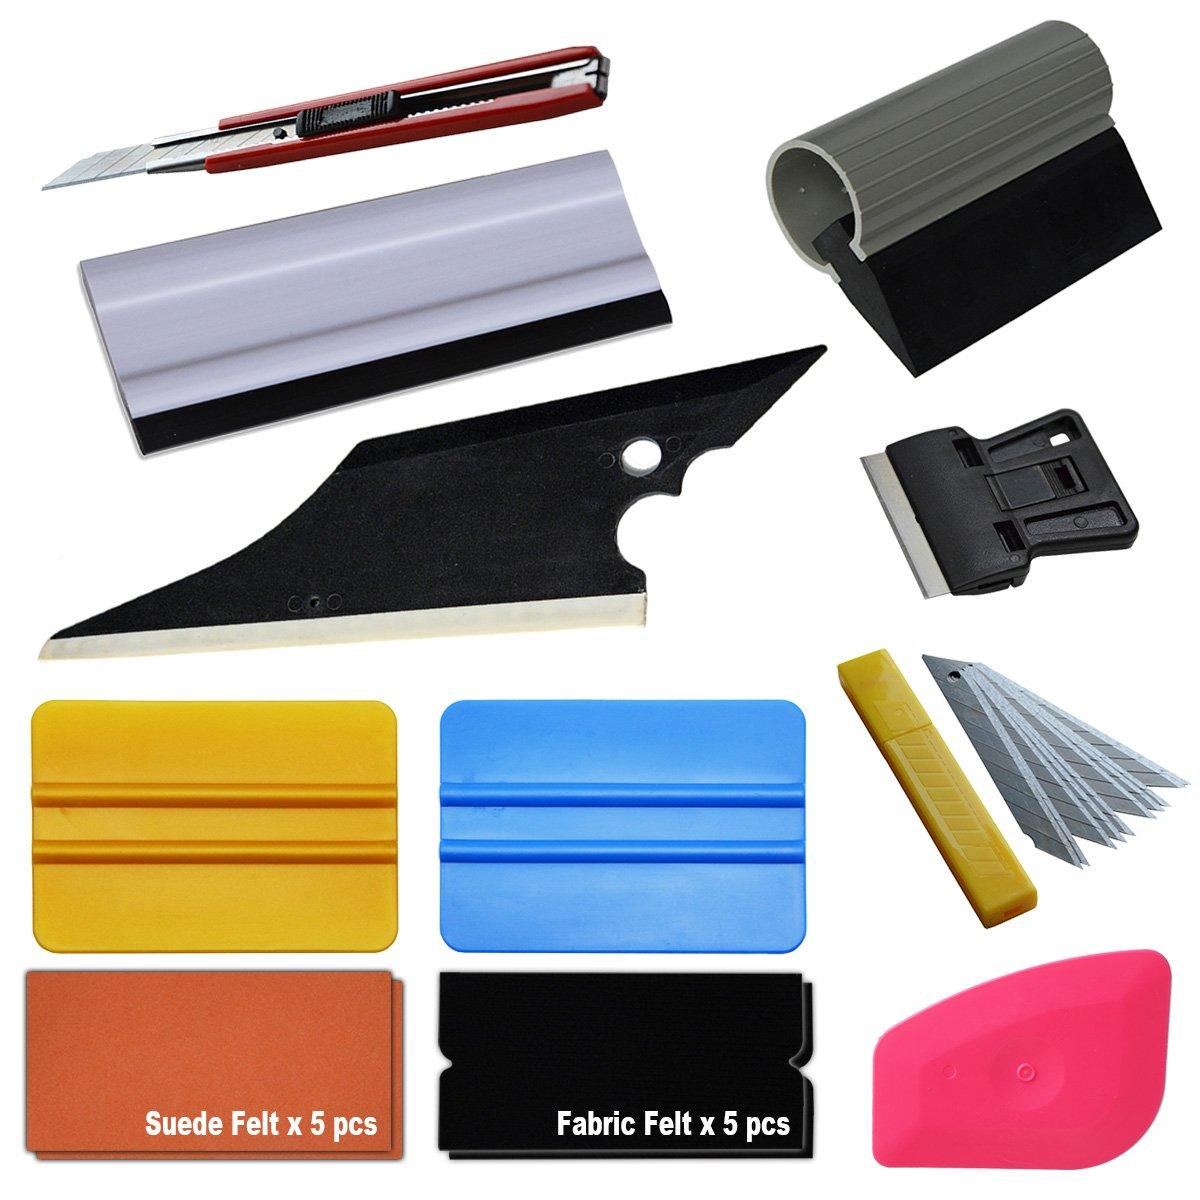 Ehdis® 6 en 1 Car Window Tint Kit Tools pour voiture Tinting Film Raclette Scraper Application Set d'installation